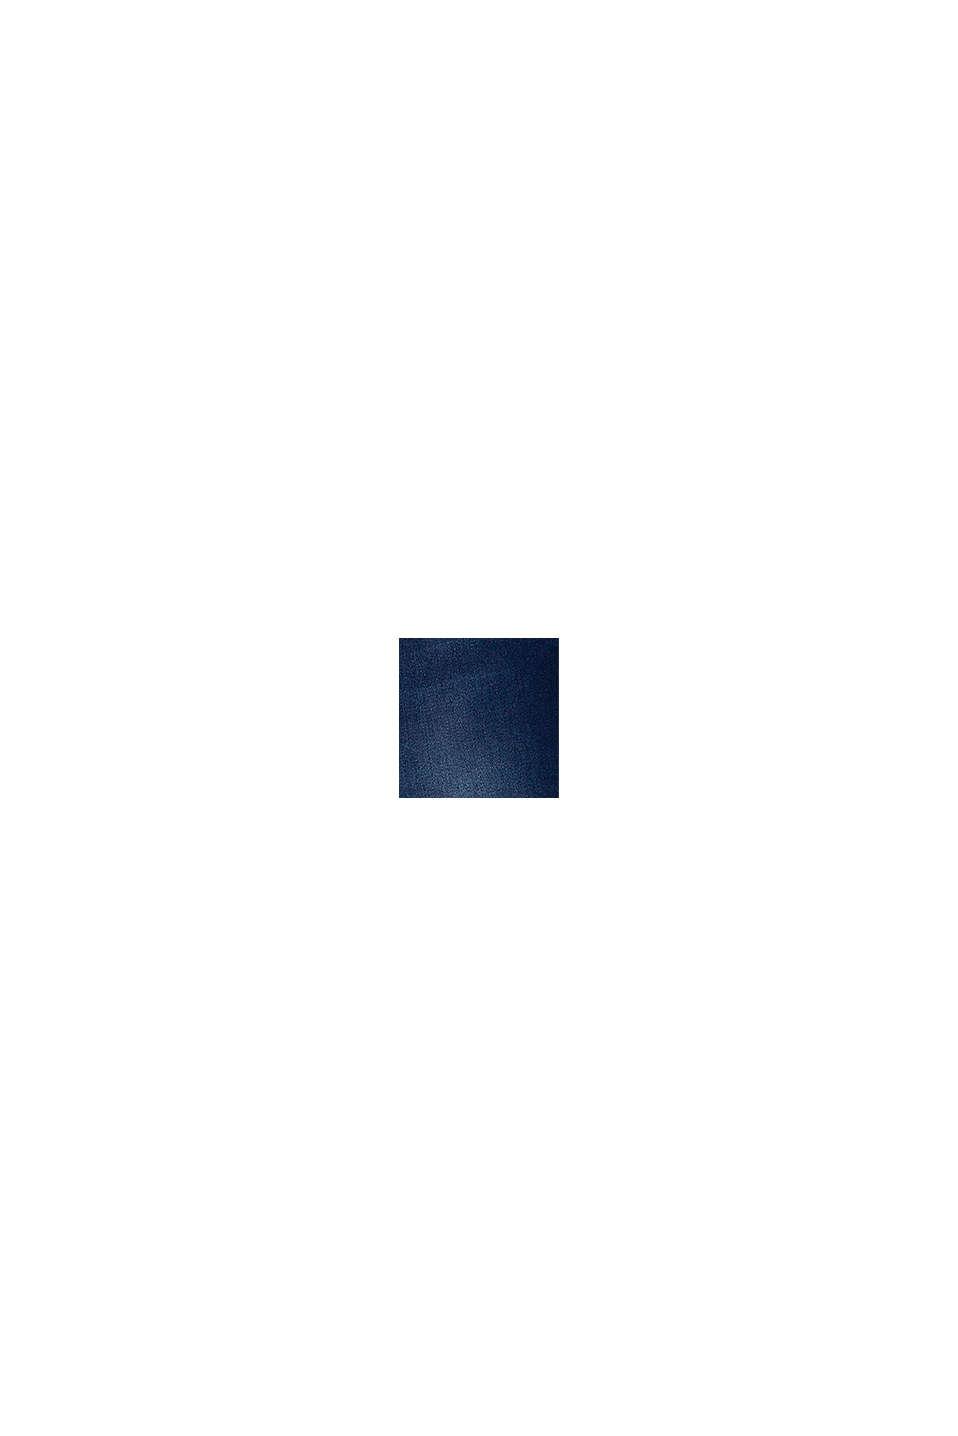 Lediga jeans med reglerbar linning, BLUE DARK WASHED, swatch